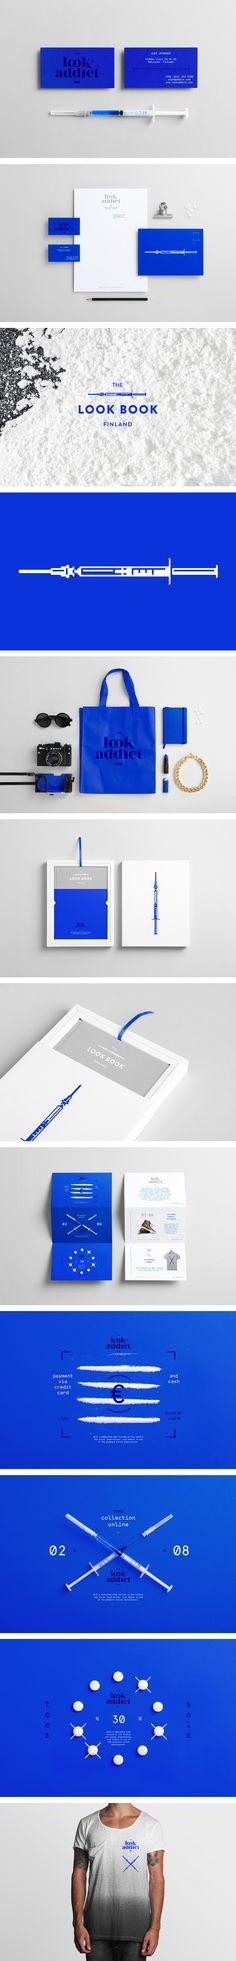 Look Addict - #branding #brands #identity #design